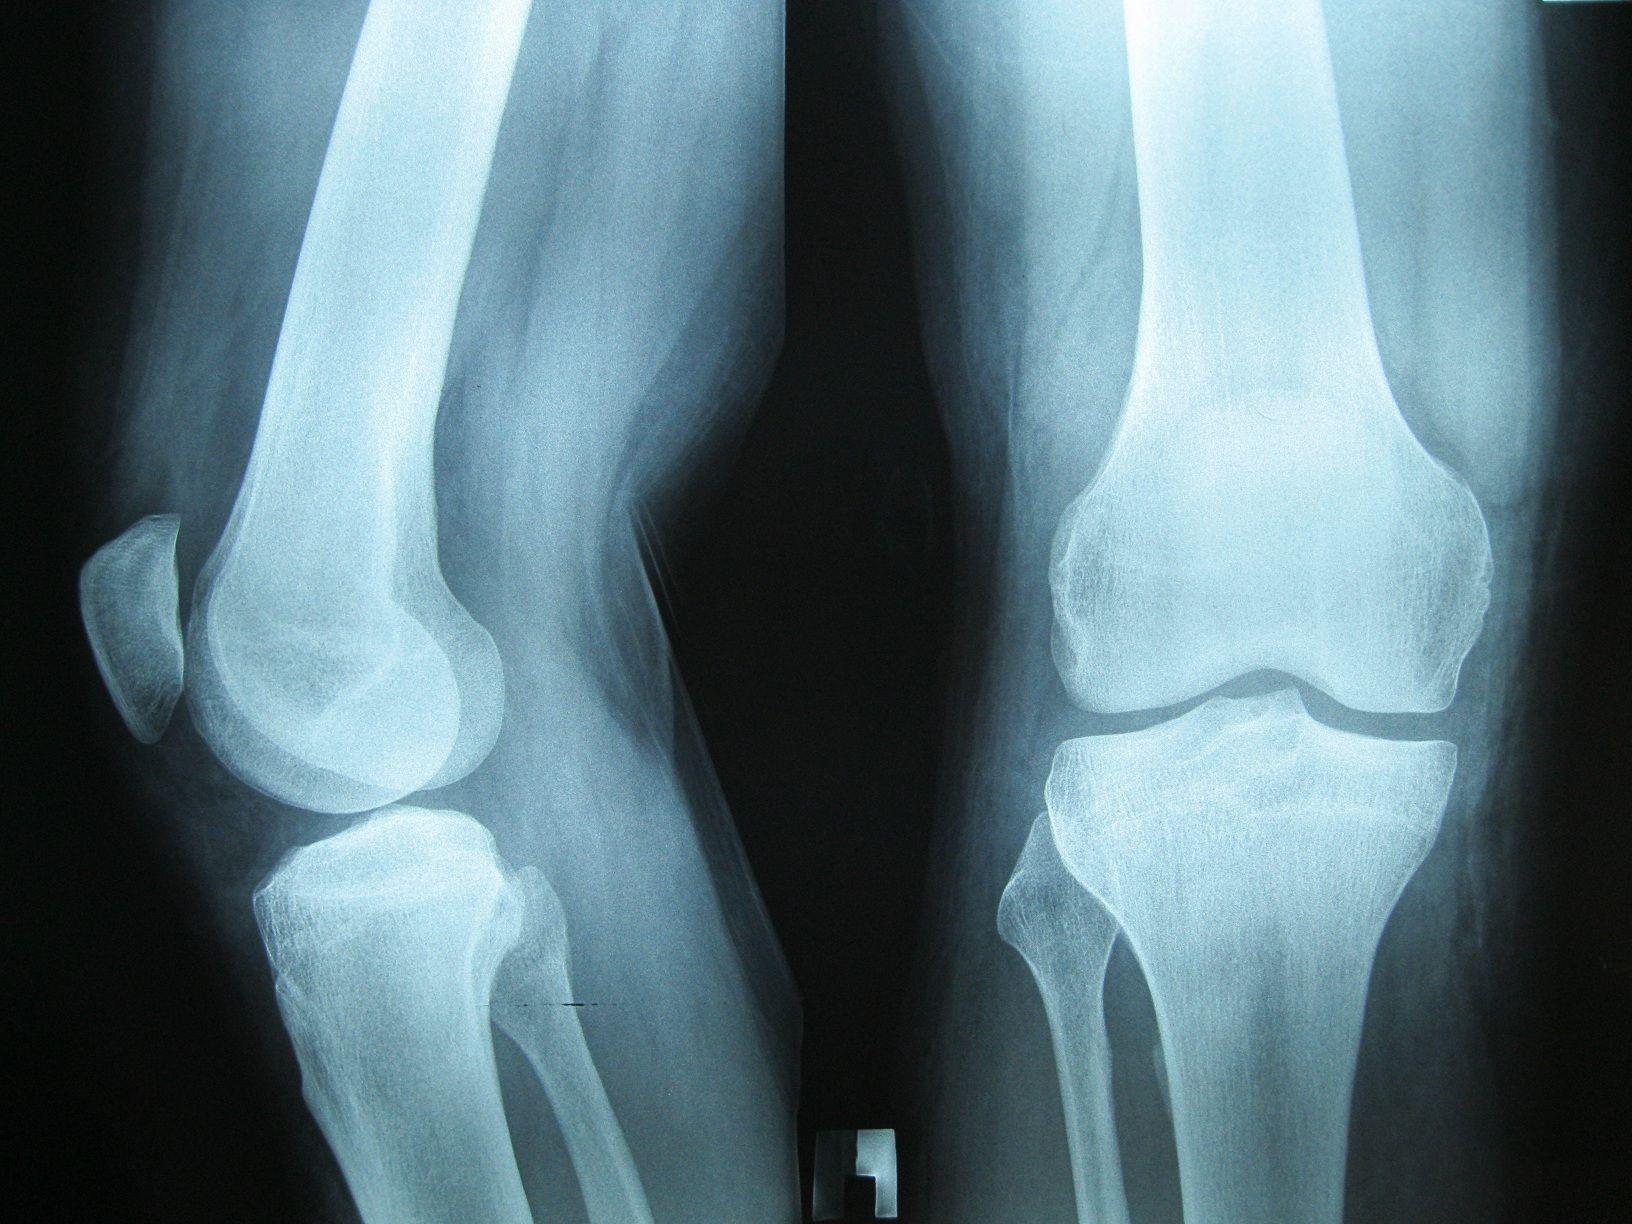 Рентген нога